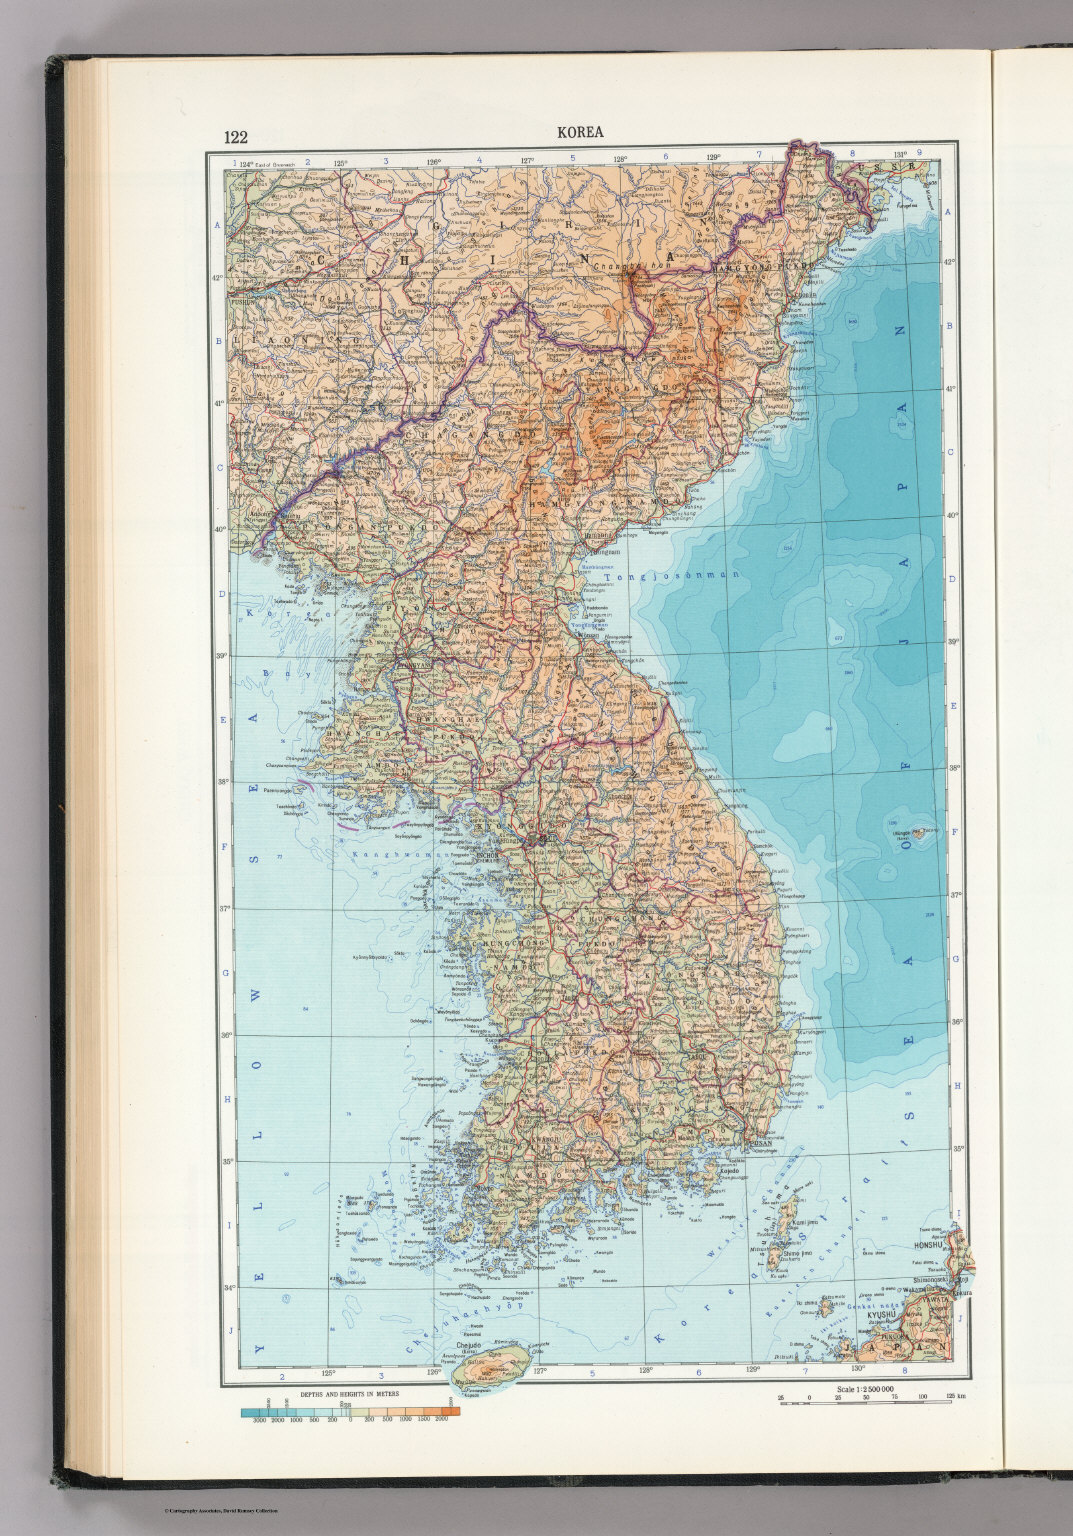 122. Korea. The World Atlas.